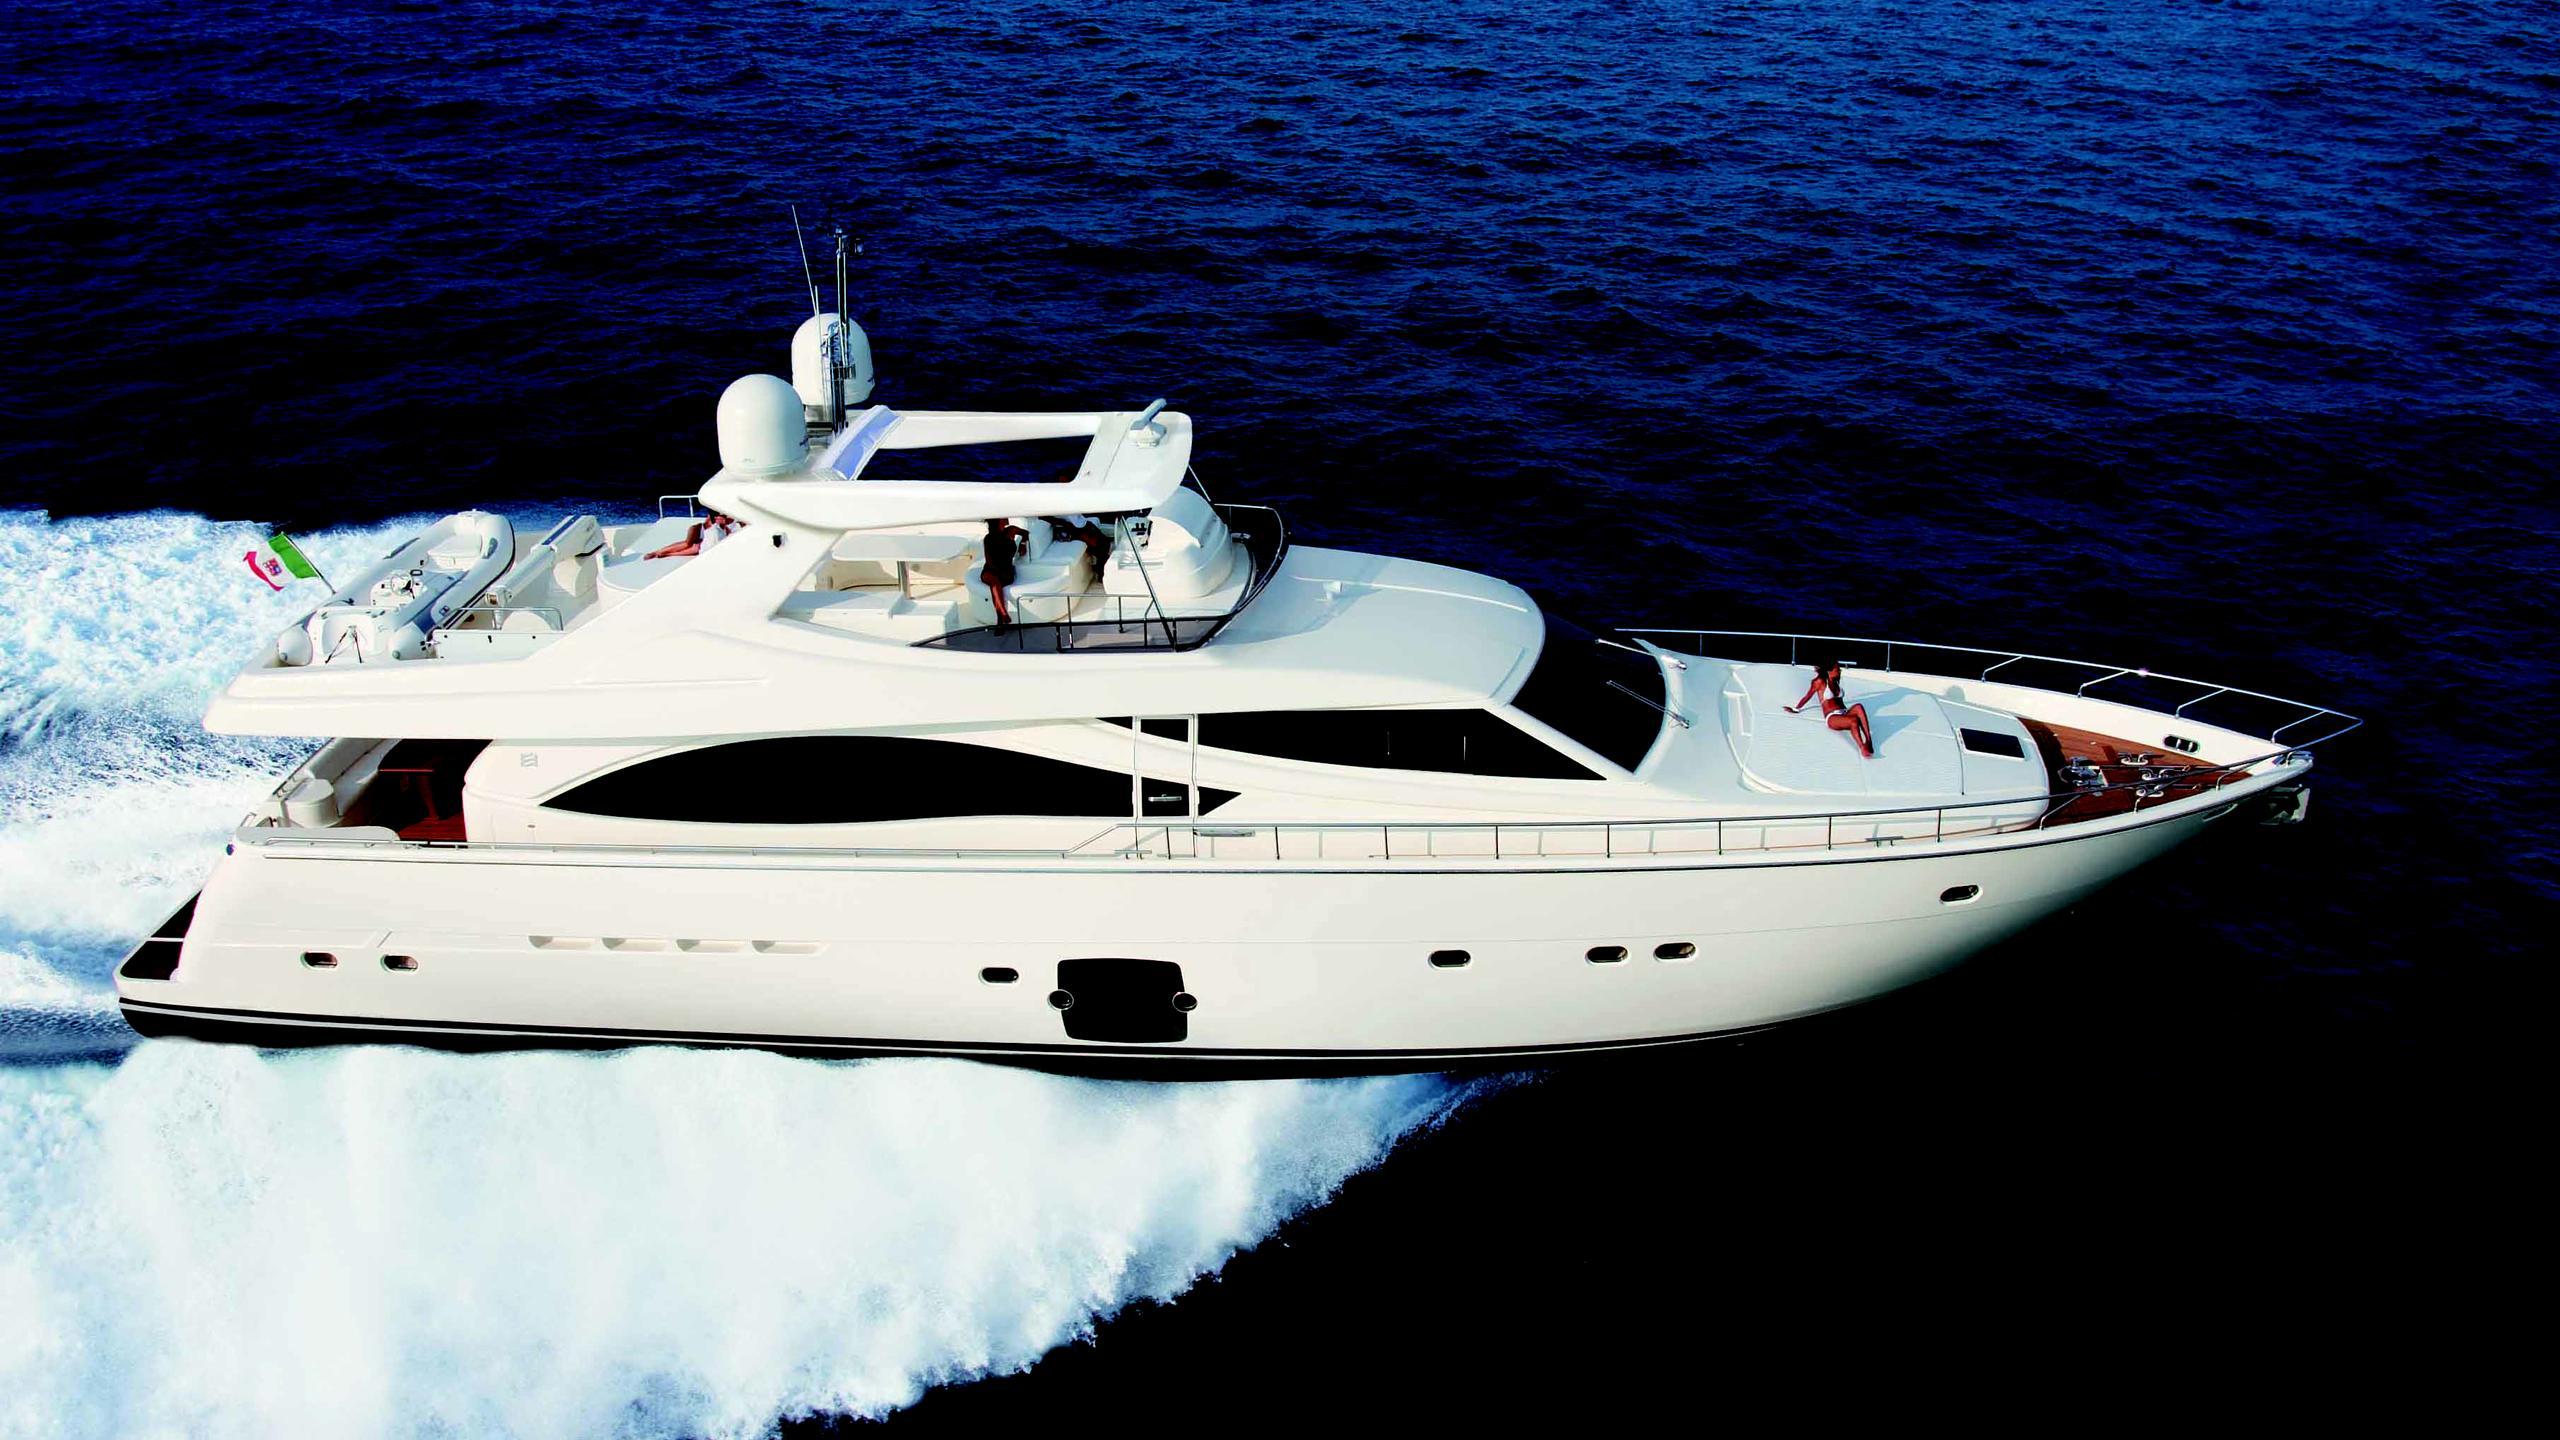 dee dee lee giddyap motoryacht ferretti 830 2005 25m cruising sistership